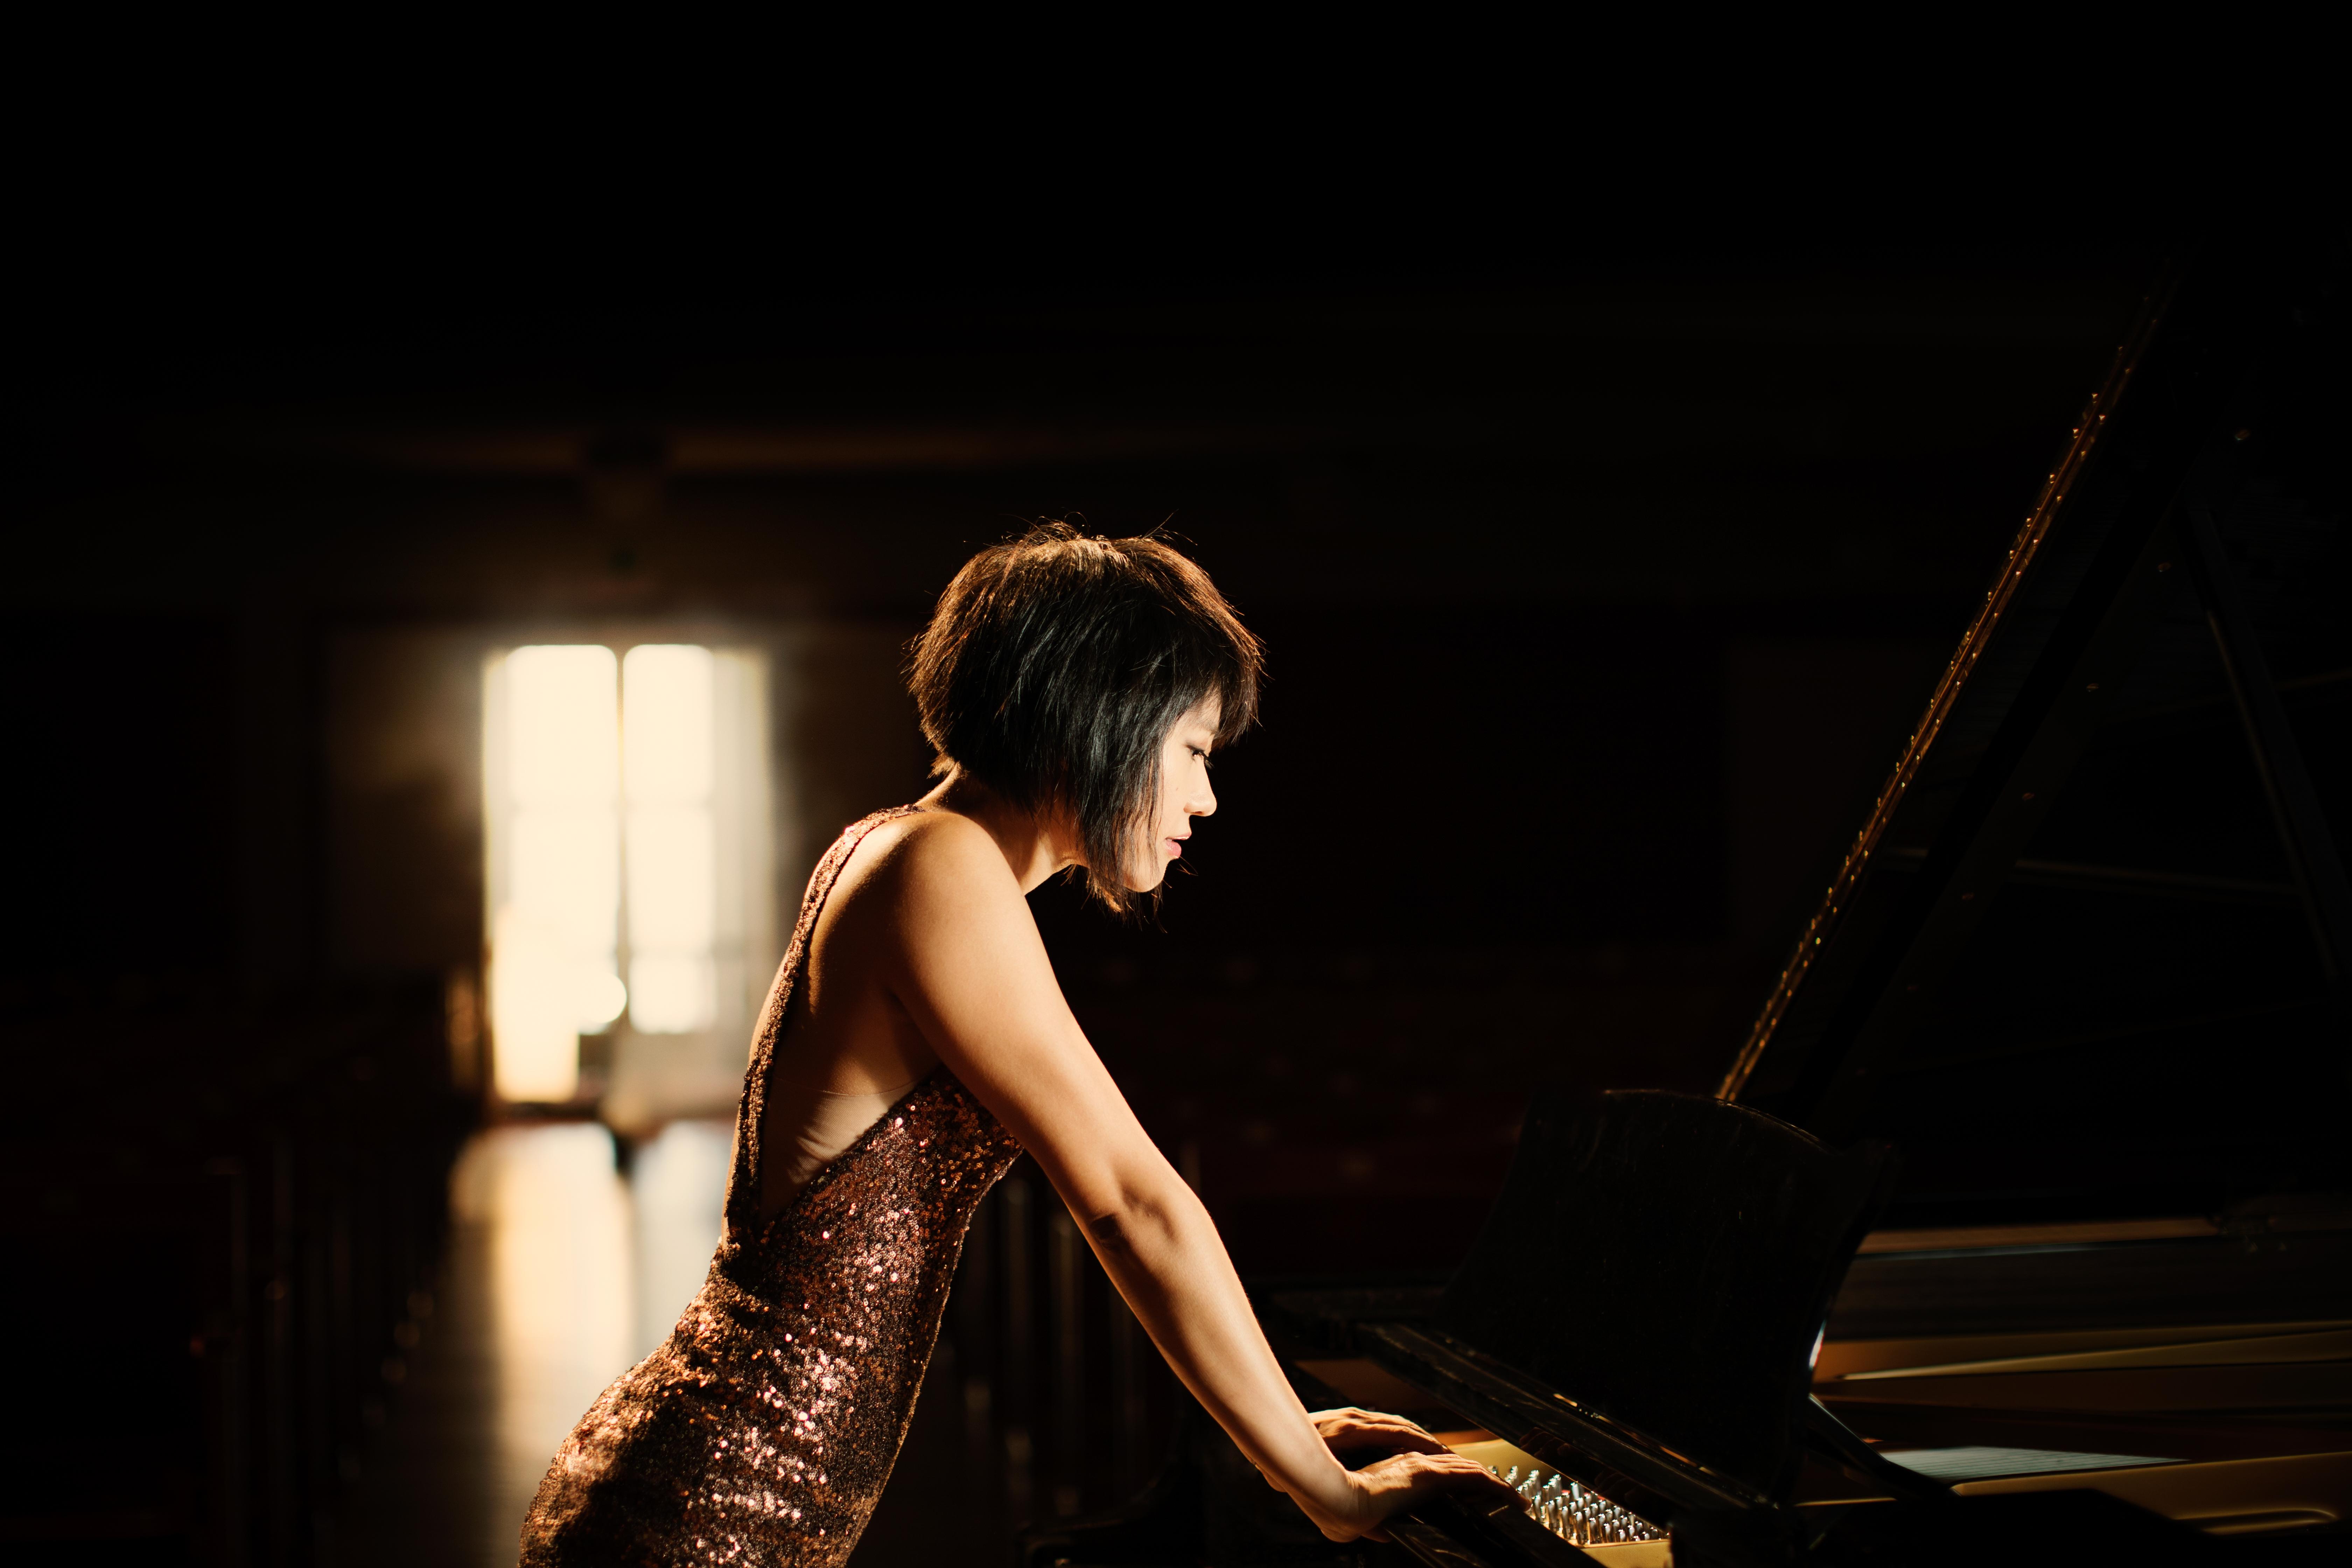 Yuja Wang plays Gretchen am Spinnrade on Israeli TV - YouTube